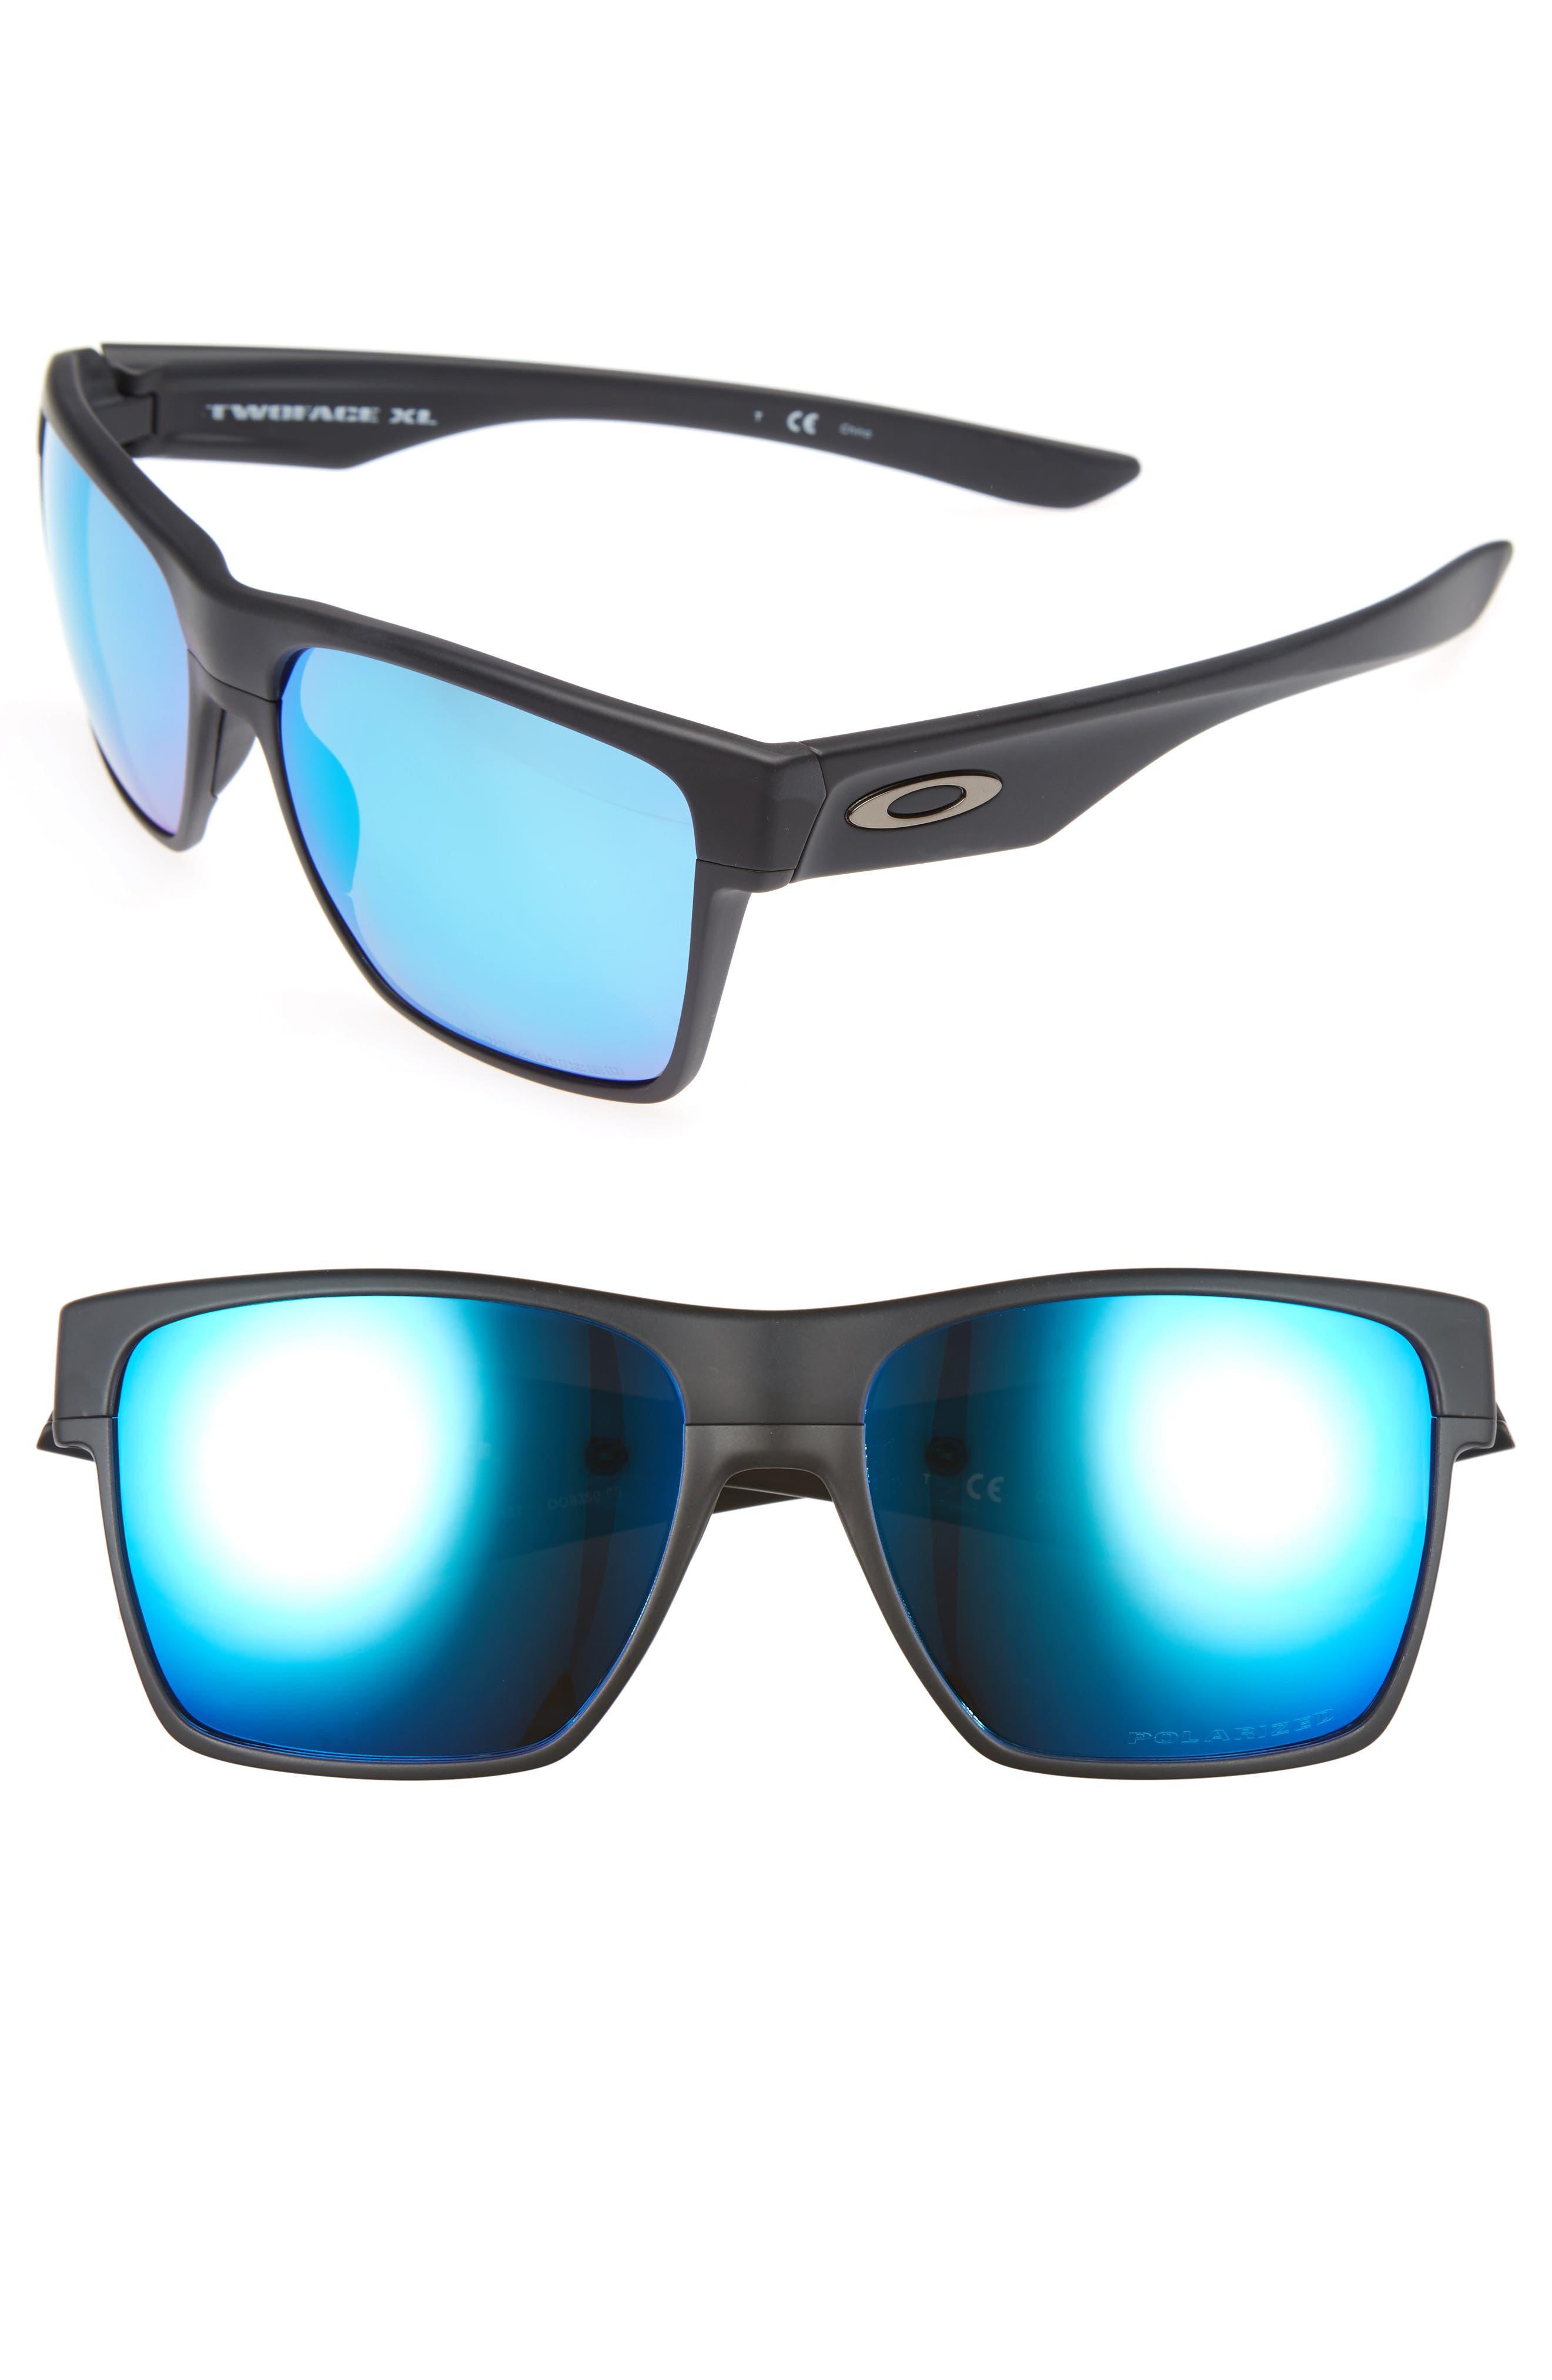 Oakley Twoface Xl 5m Polarized Sunglasses -